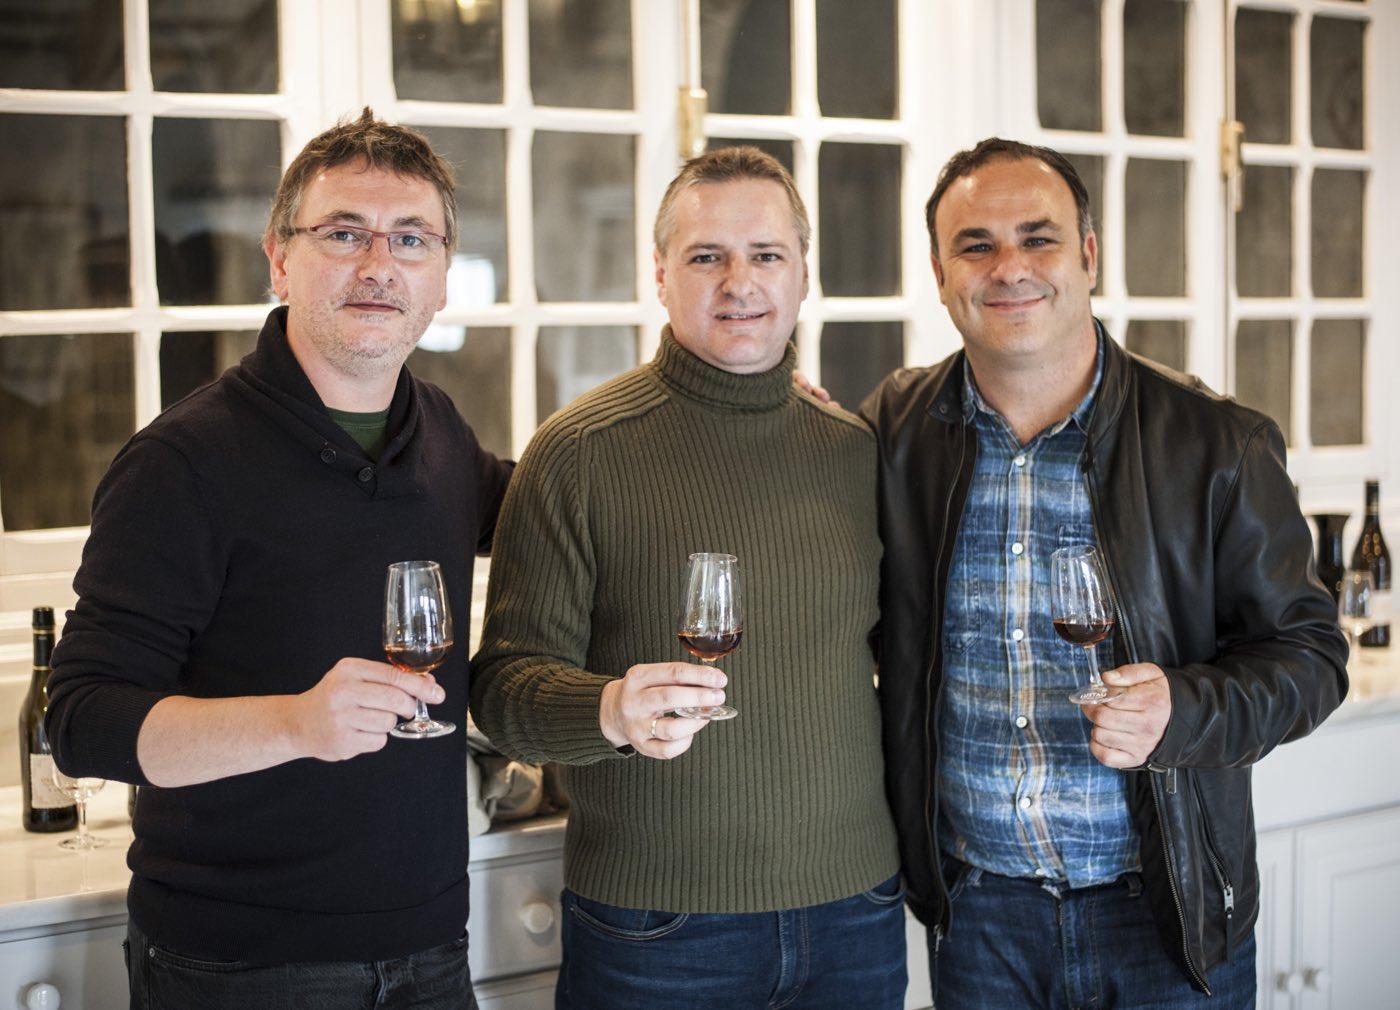 Sergio Mtnez + Ángel León + Andoni Luis Aduriz